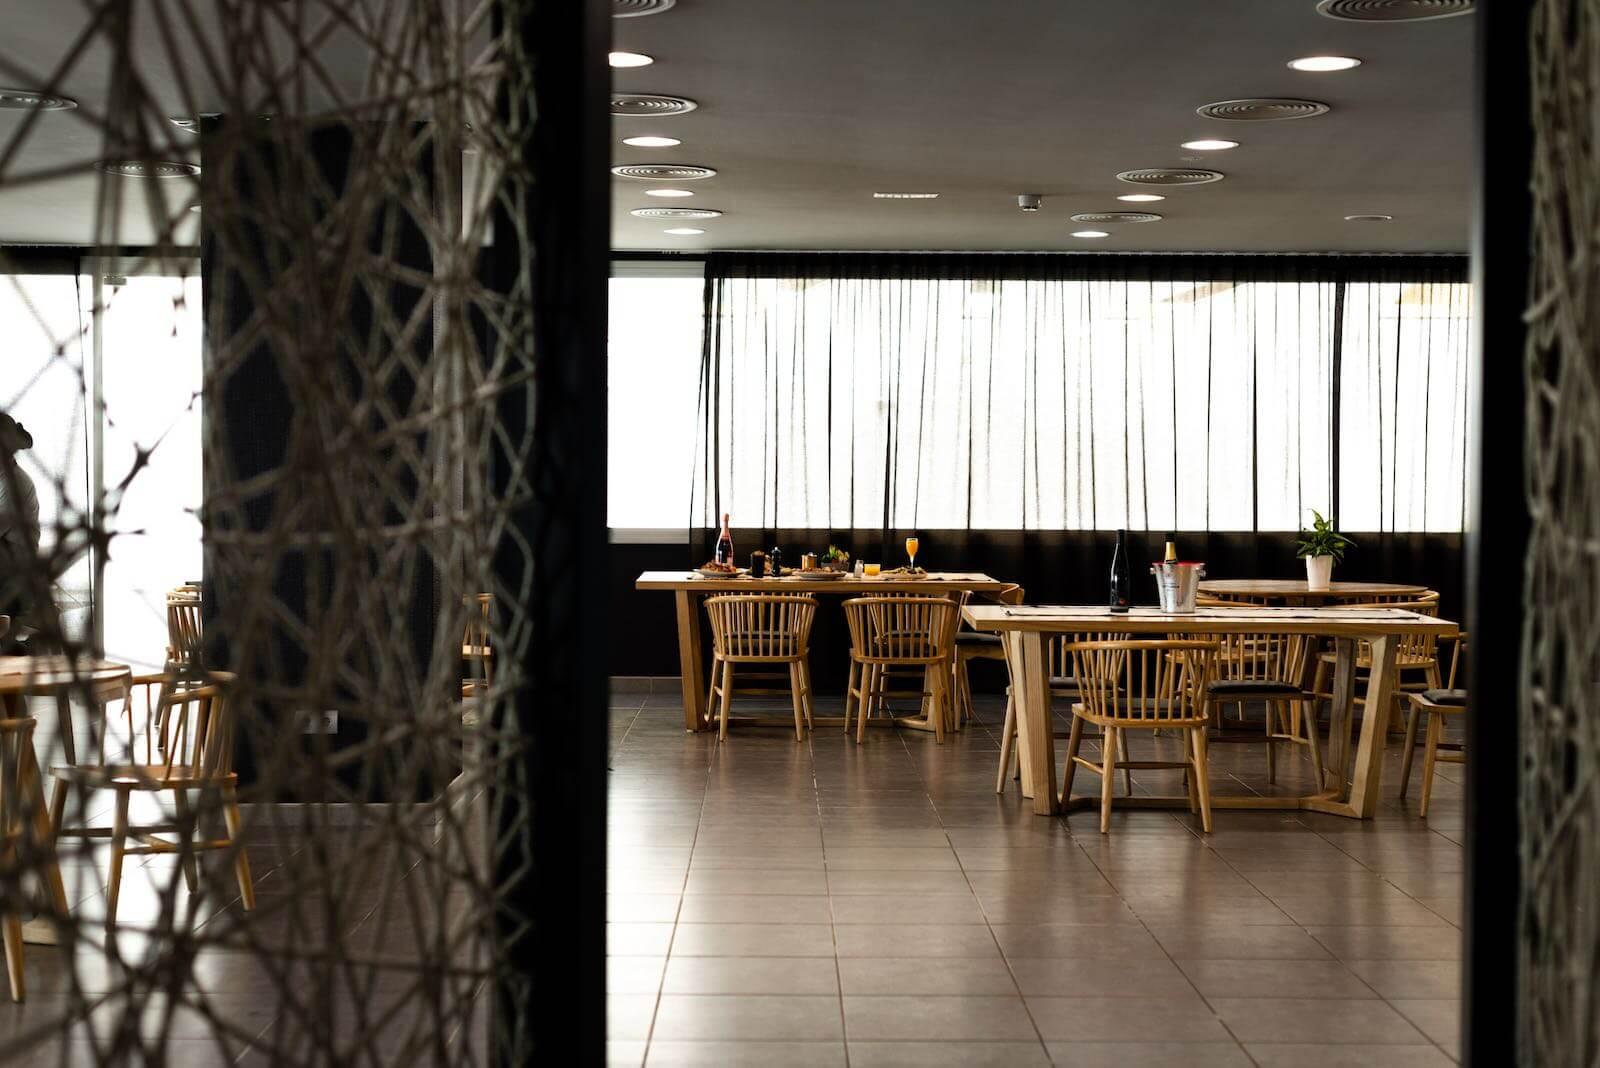 https://www.white-ibiza.com/wp-content/uploads/2020/07/white-ibiza-restaurants-hawker-beach-club-ibiza-2020-07.jpeg